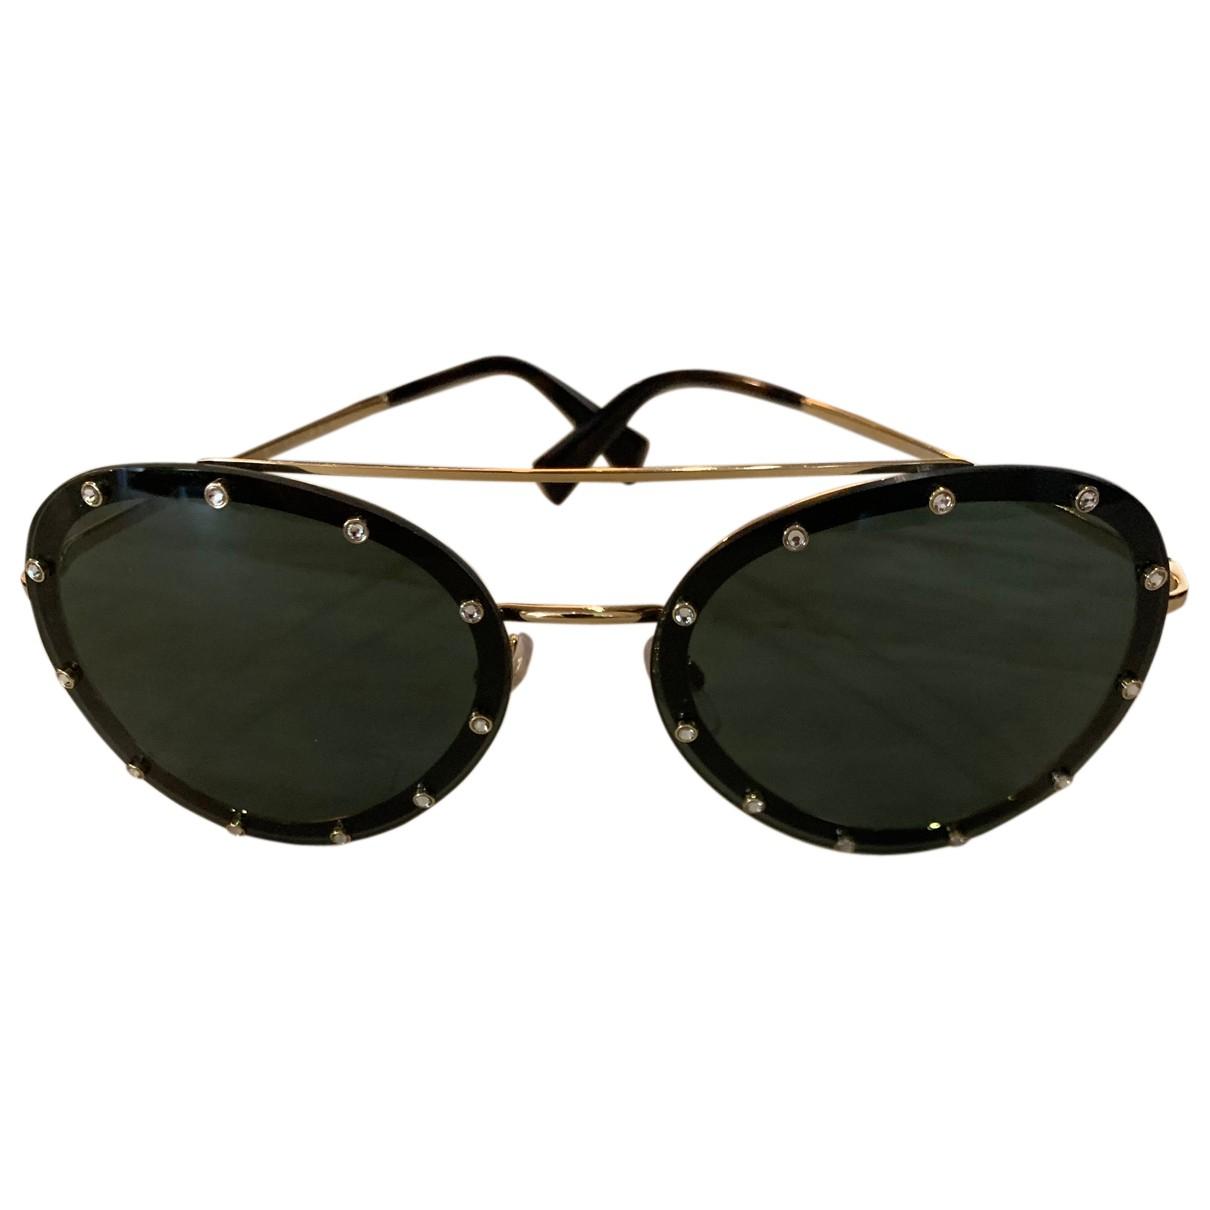 Valentino Garavani N Black Metal Sunglasses for Women N